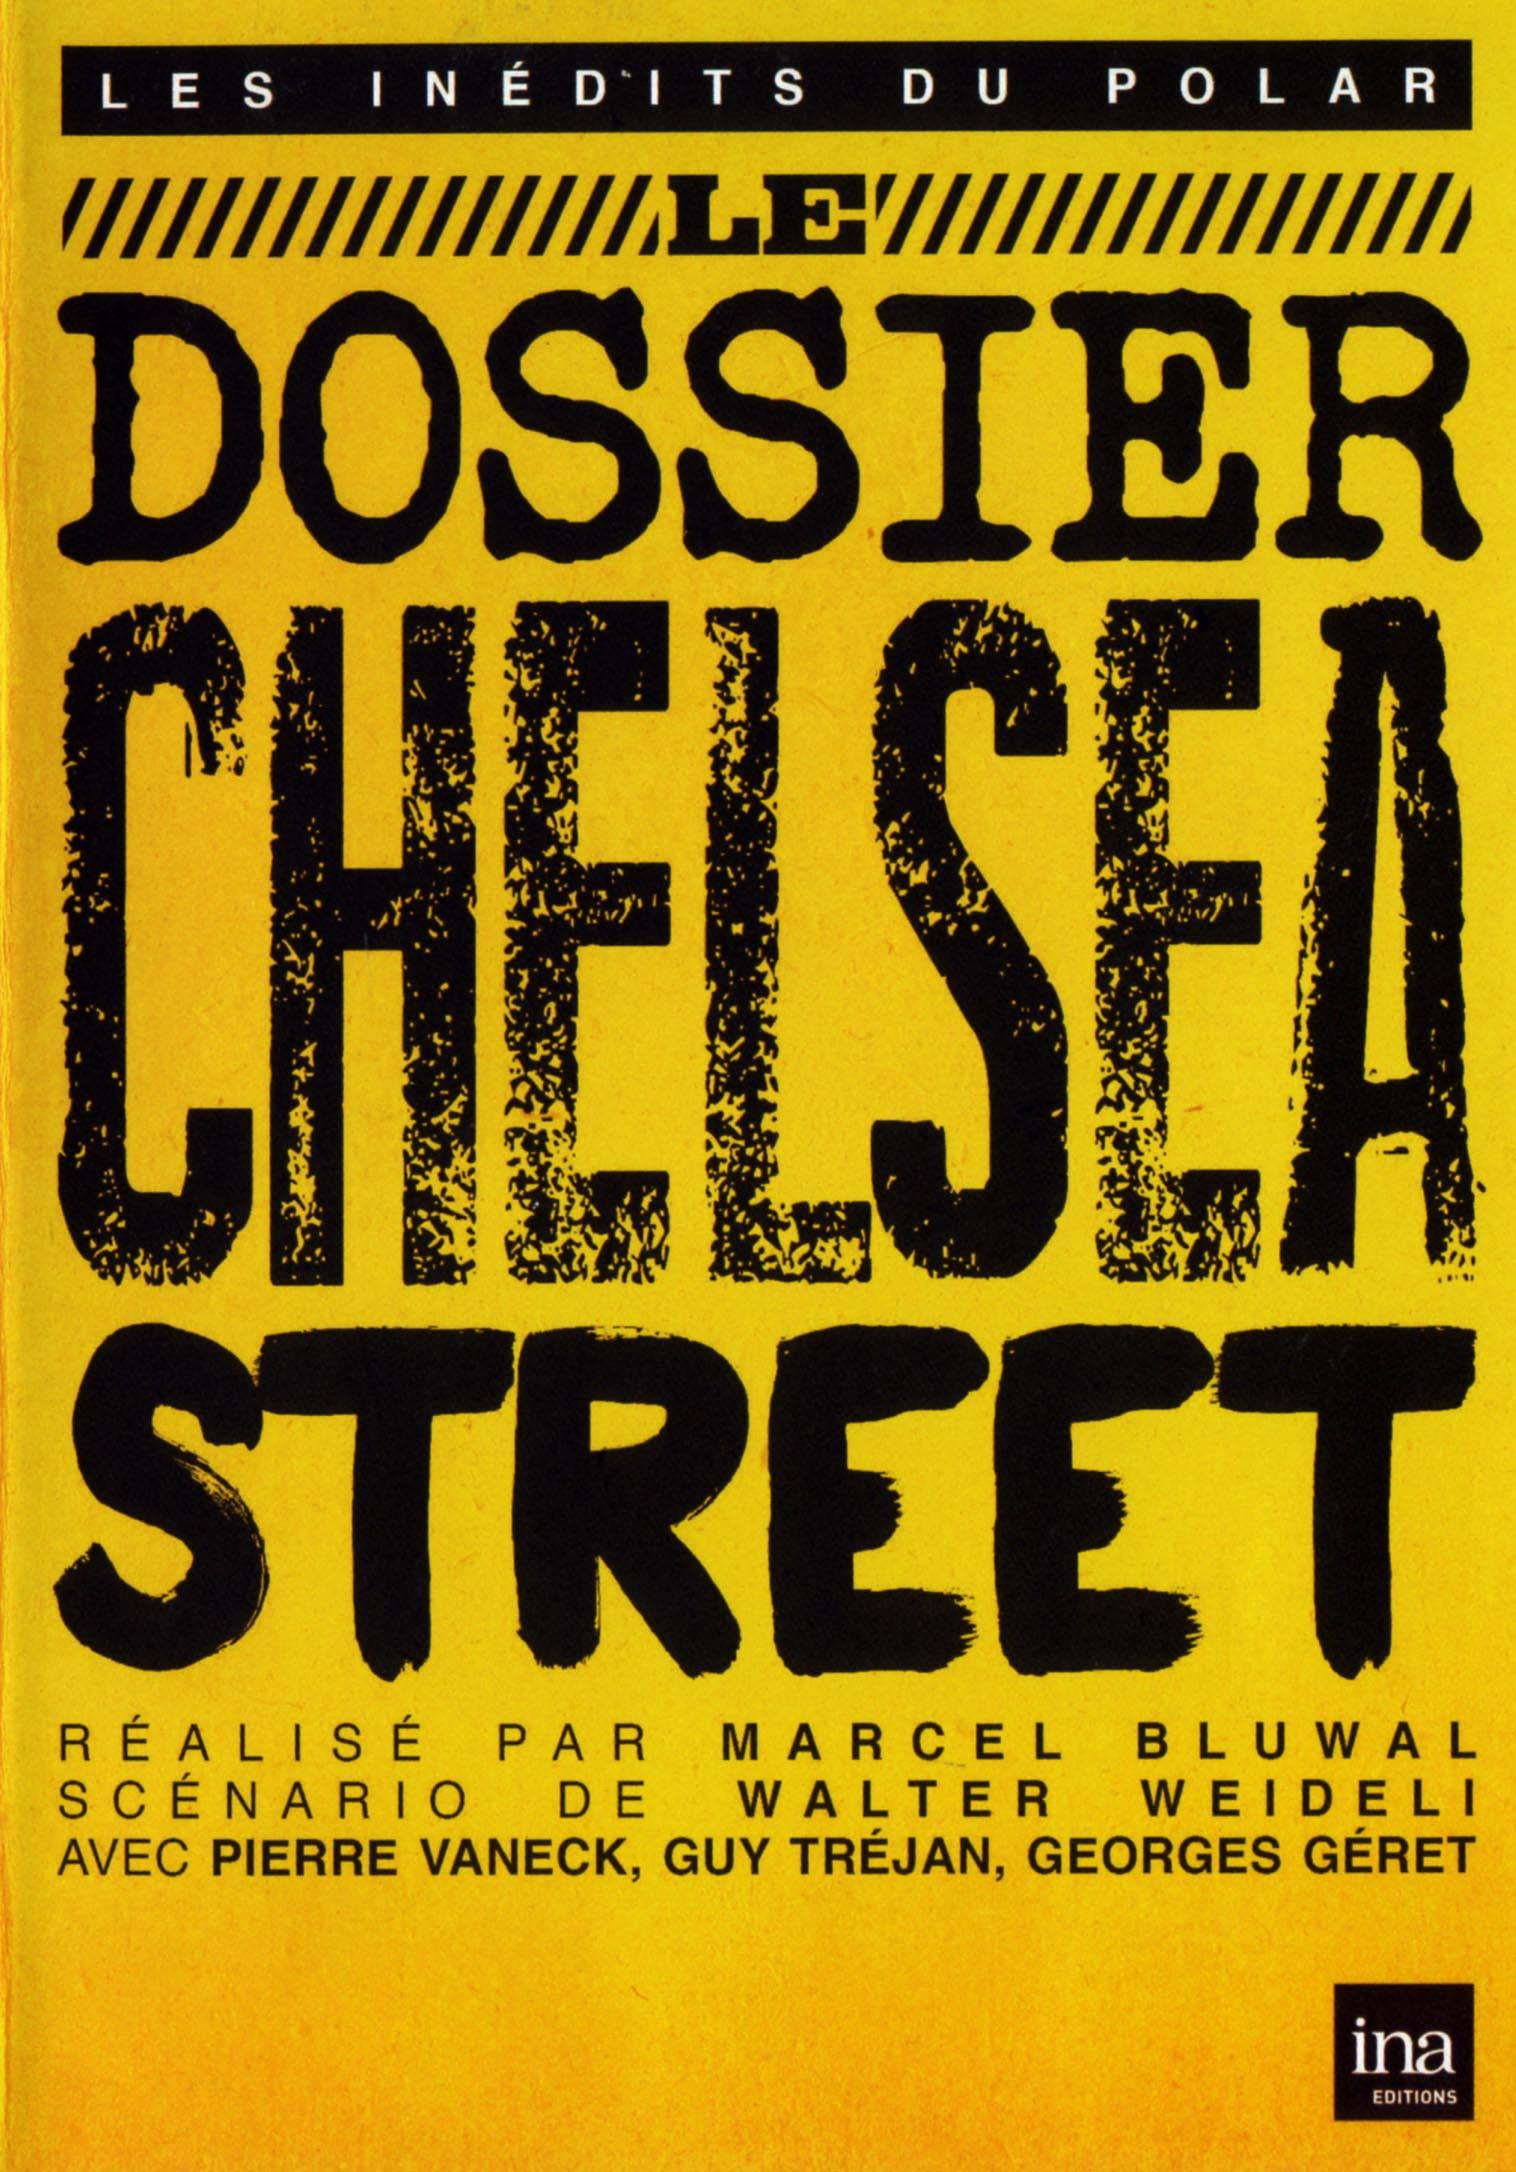 Dossier chelsea street (le) -dvd